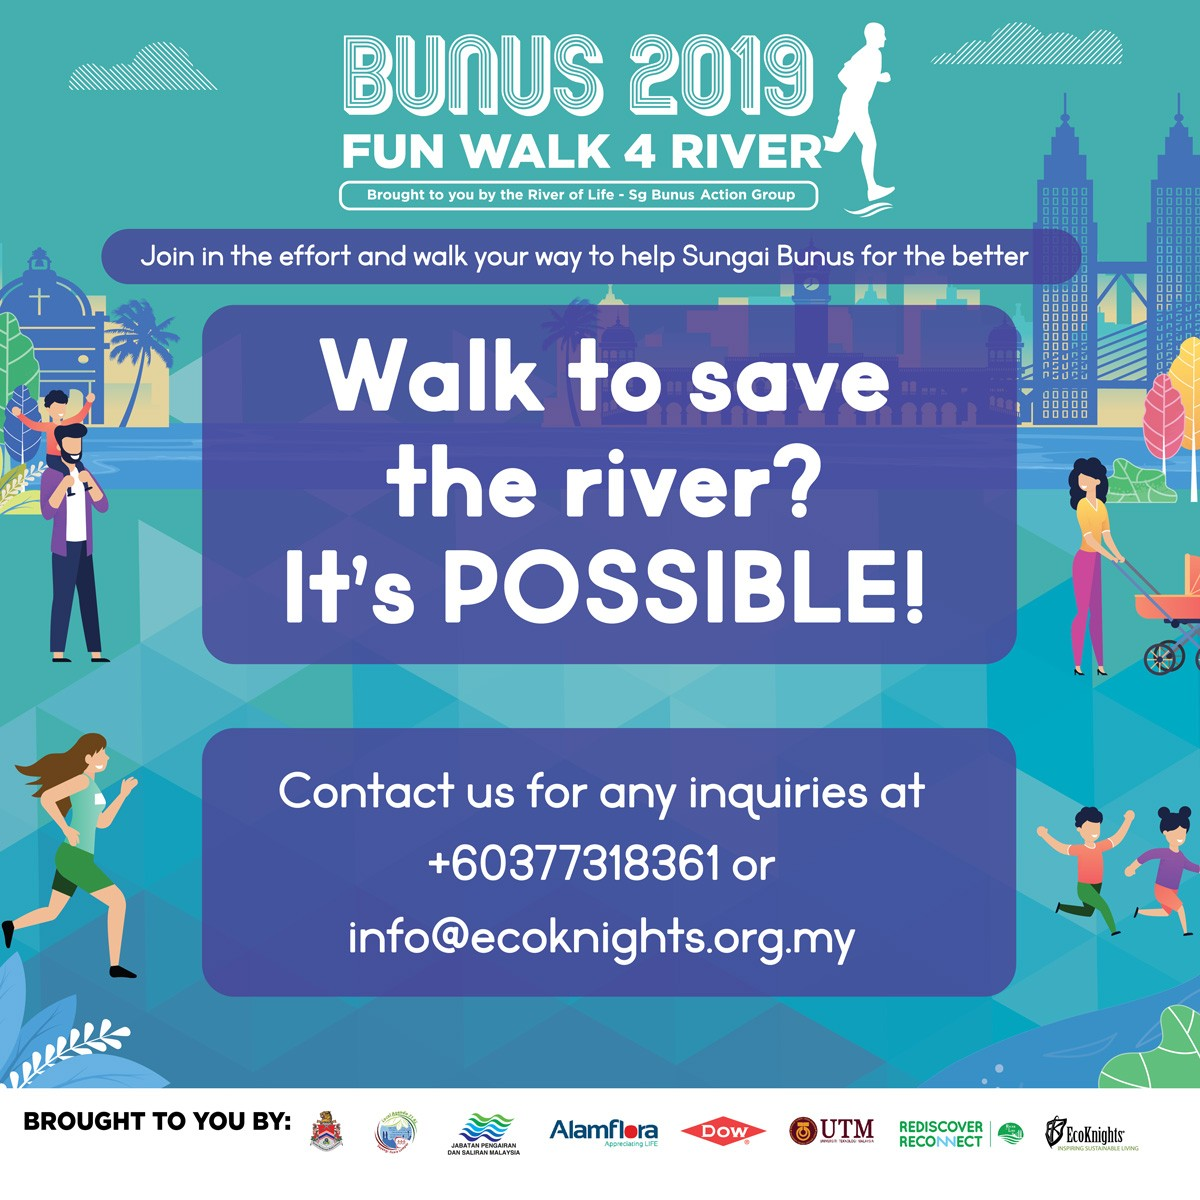 Bunus Fun Walk 4 River 2019